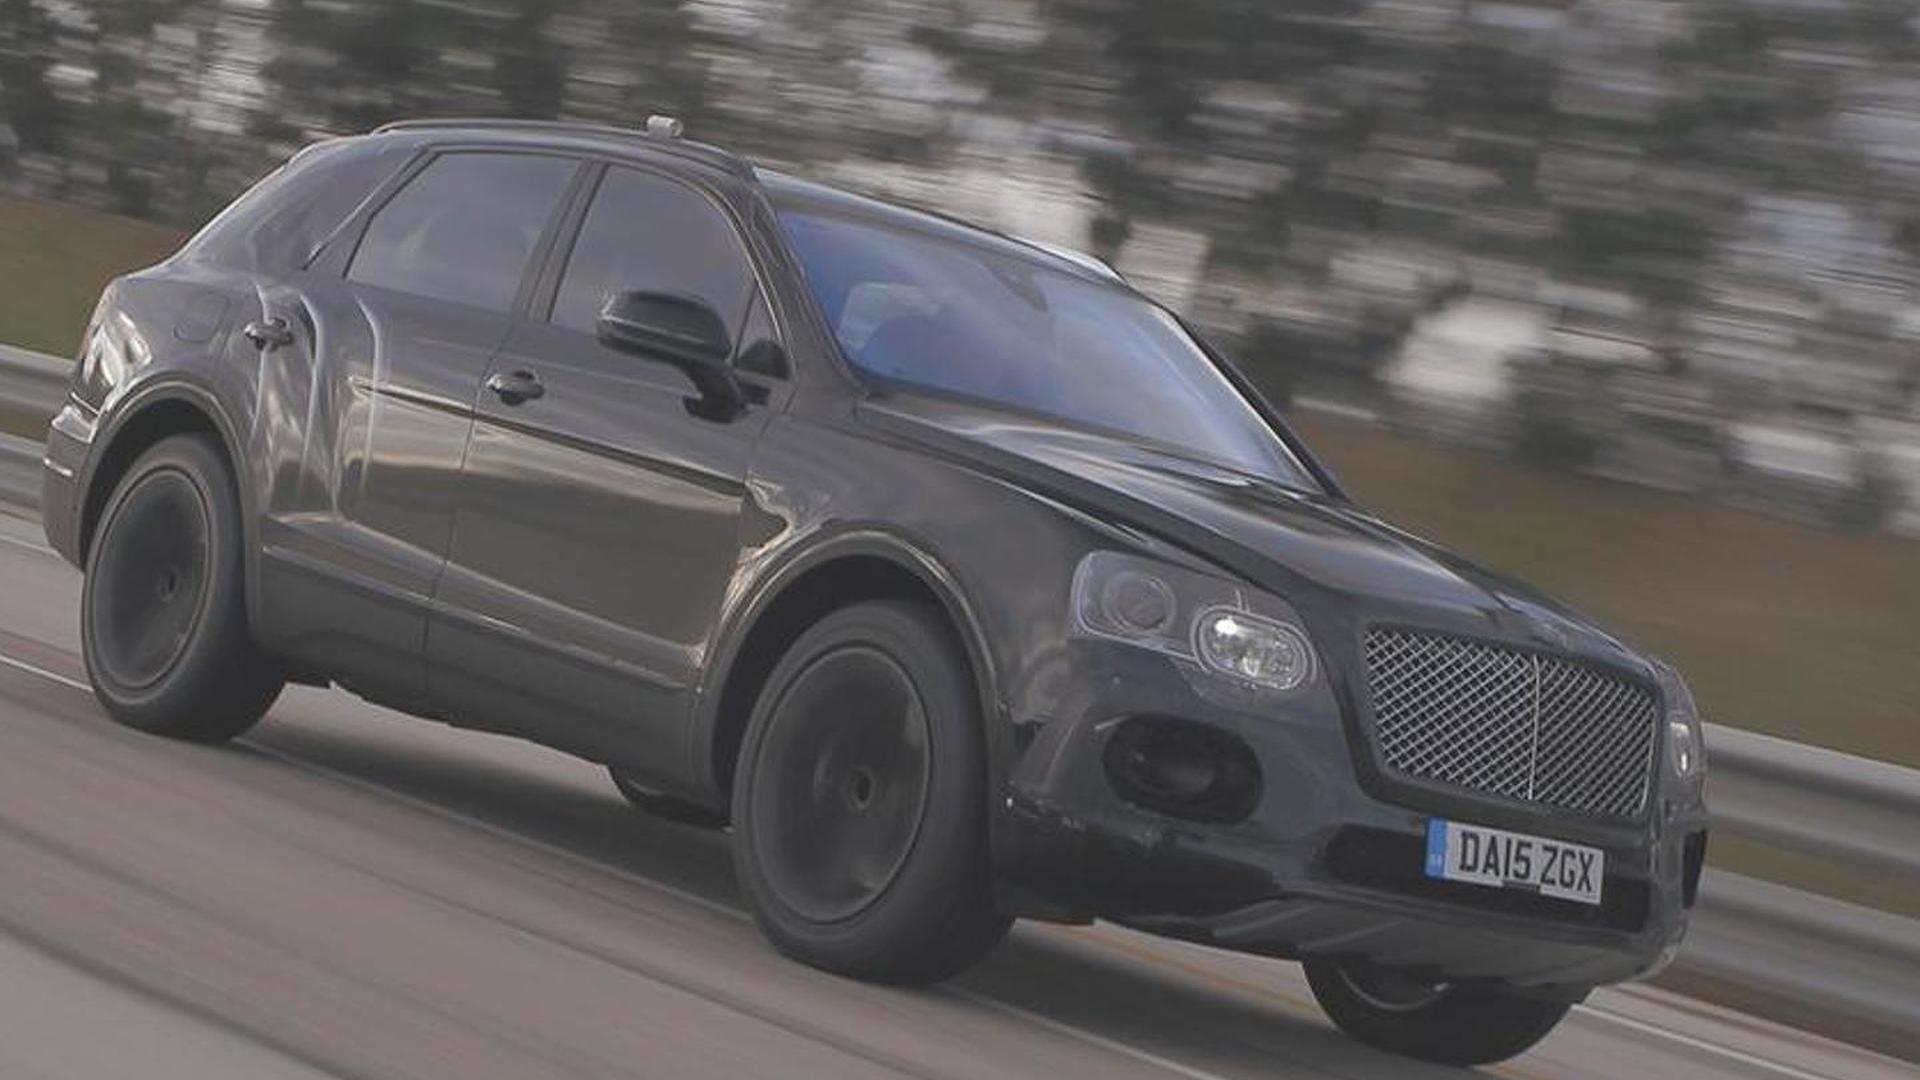 Bentley shows the W12-powered Bentayga hitting 301 km/h [video]